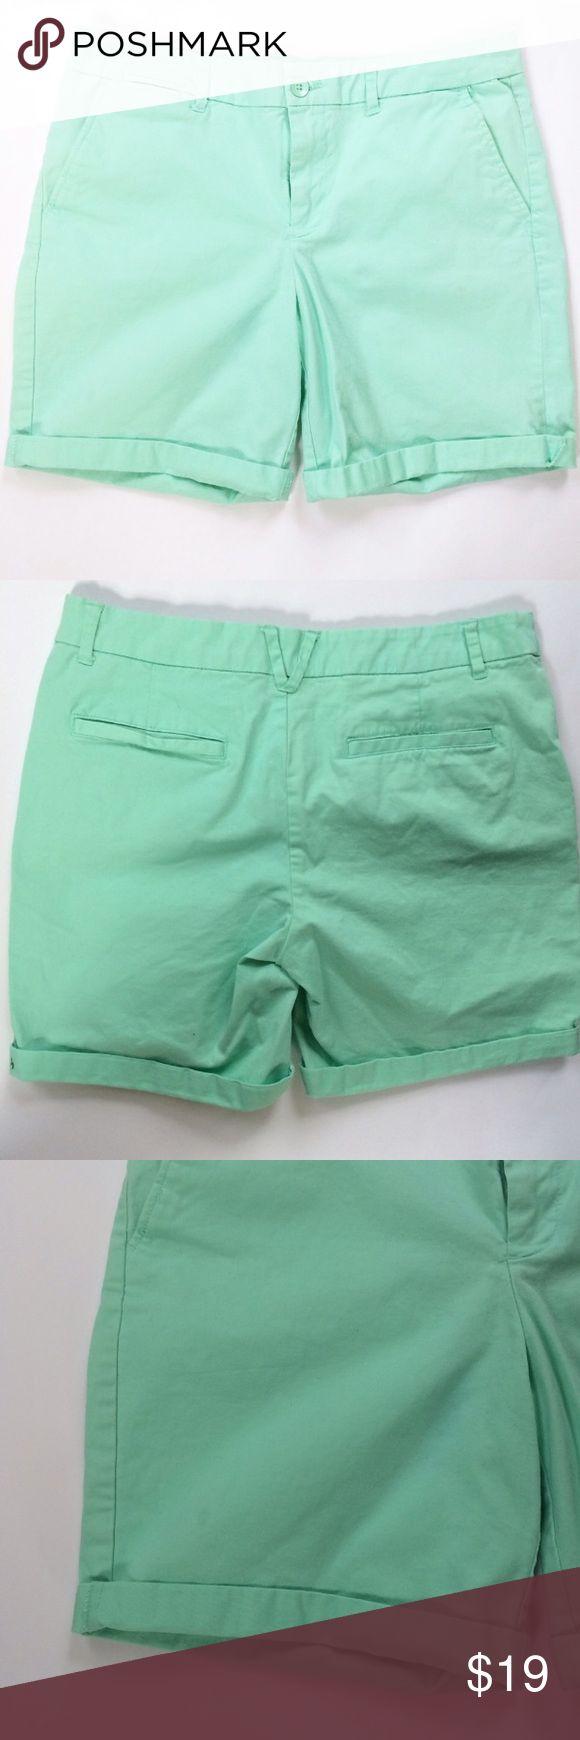 "GAP khakis Mint green boyfriend roll up Shorts Cotton roll up Boyfriend shorts. Gently worn. Zipper and button closure. Waist 16"". Inseam 7"" when rolled. GAP Shorts"